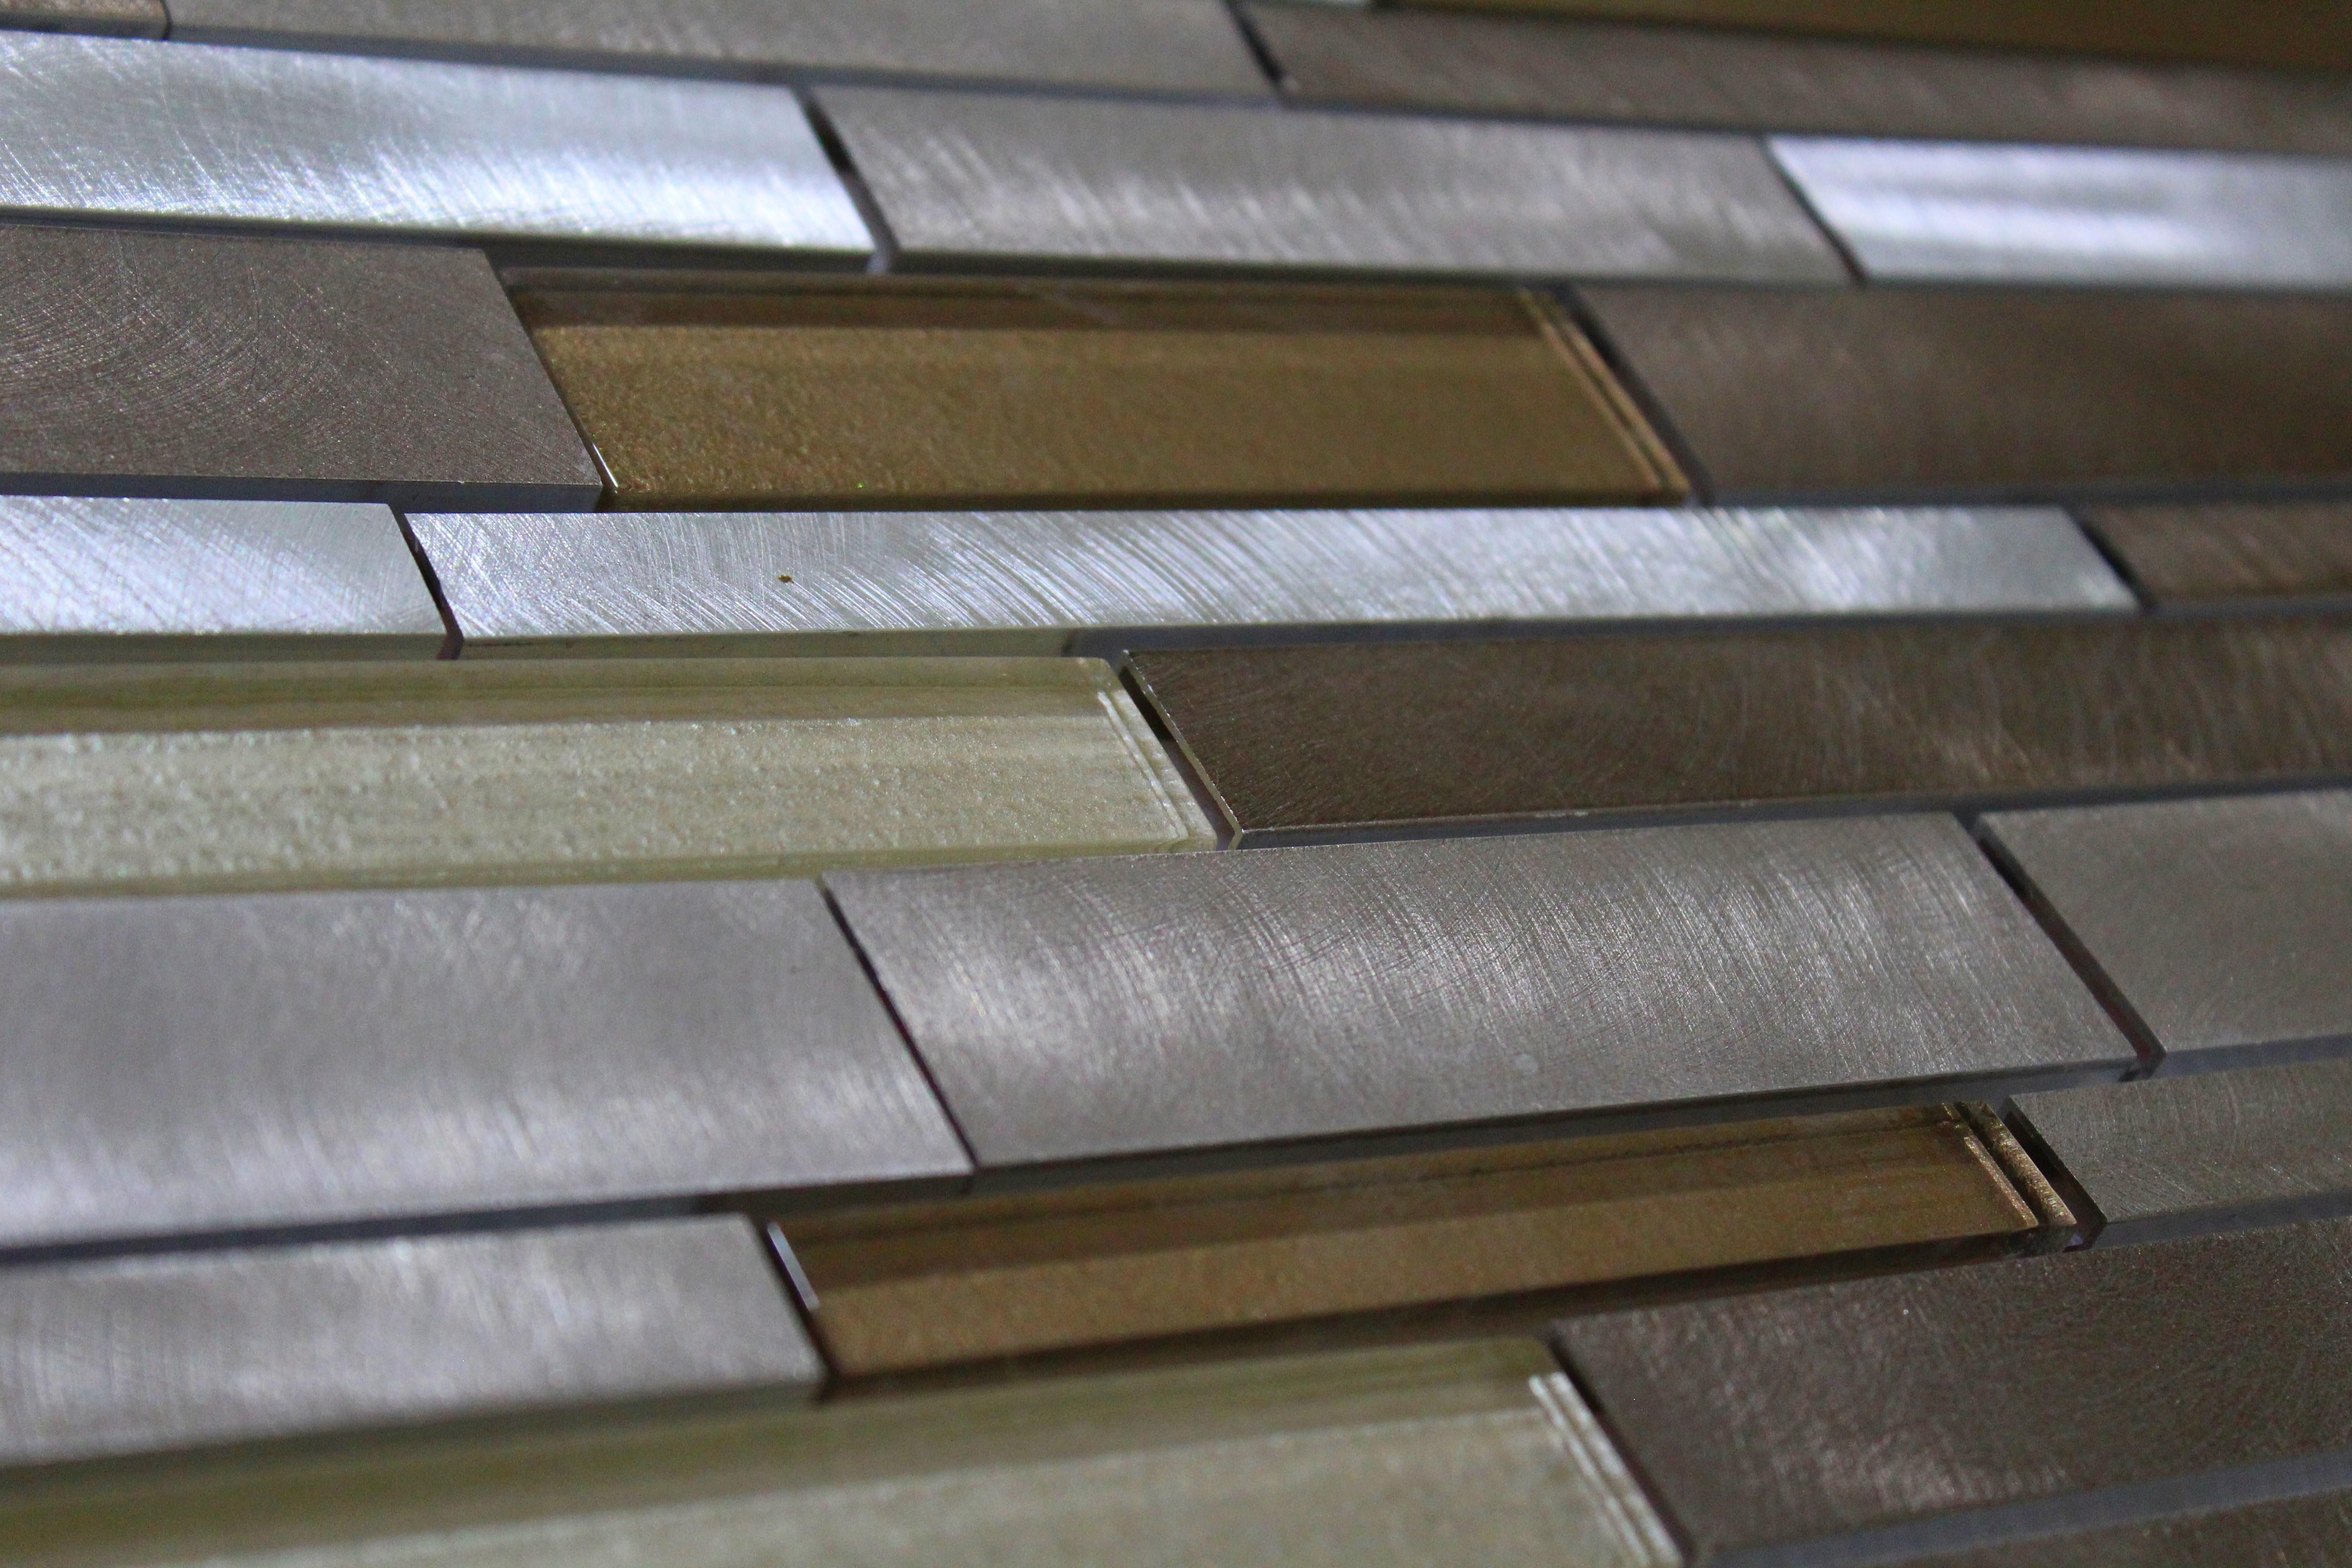 Glass Mosaic / 14 x 12 x 0.31 inches / Glossy Interlocking Random Sized Glass & Aluminum Mosaic Tile In Earth 0